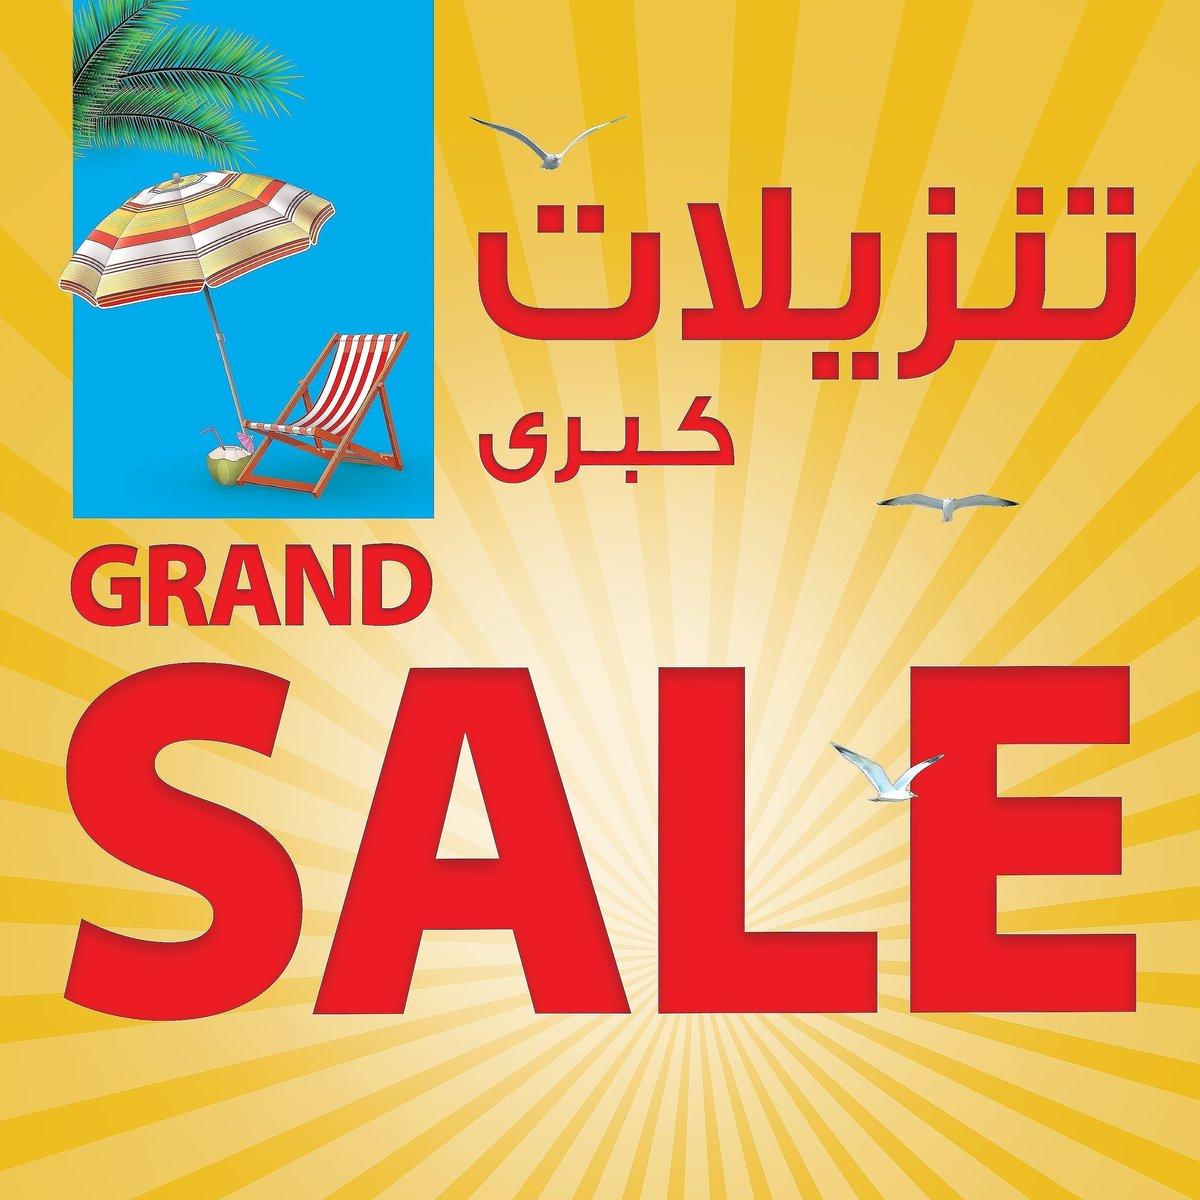 771b594c4 لا تفوتوا التنزيلات الكبرى الآن لدى النصر Don't miss out GRAND SALE now at Al  Nasser #kuwait #summer #grand #sale #prices #q8 #alnasser #الكويت #تسوق ...